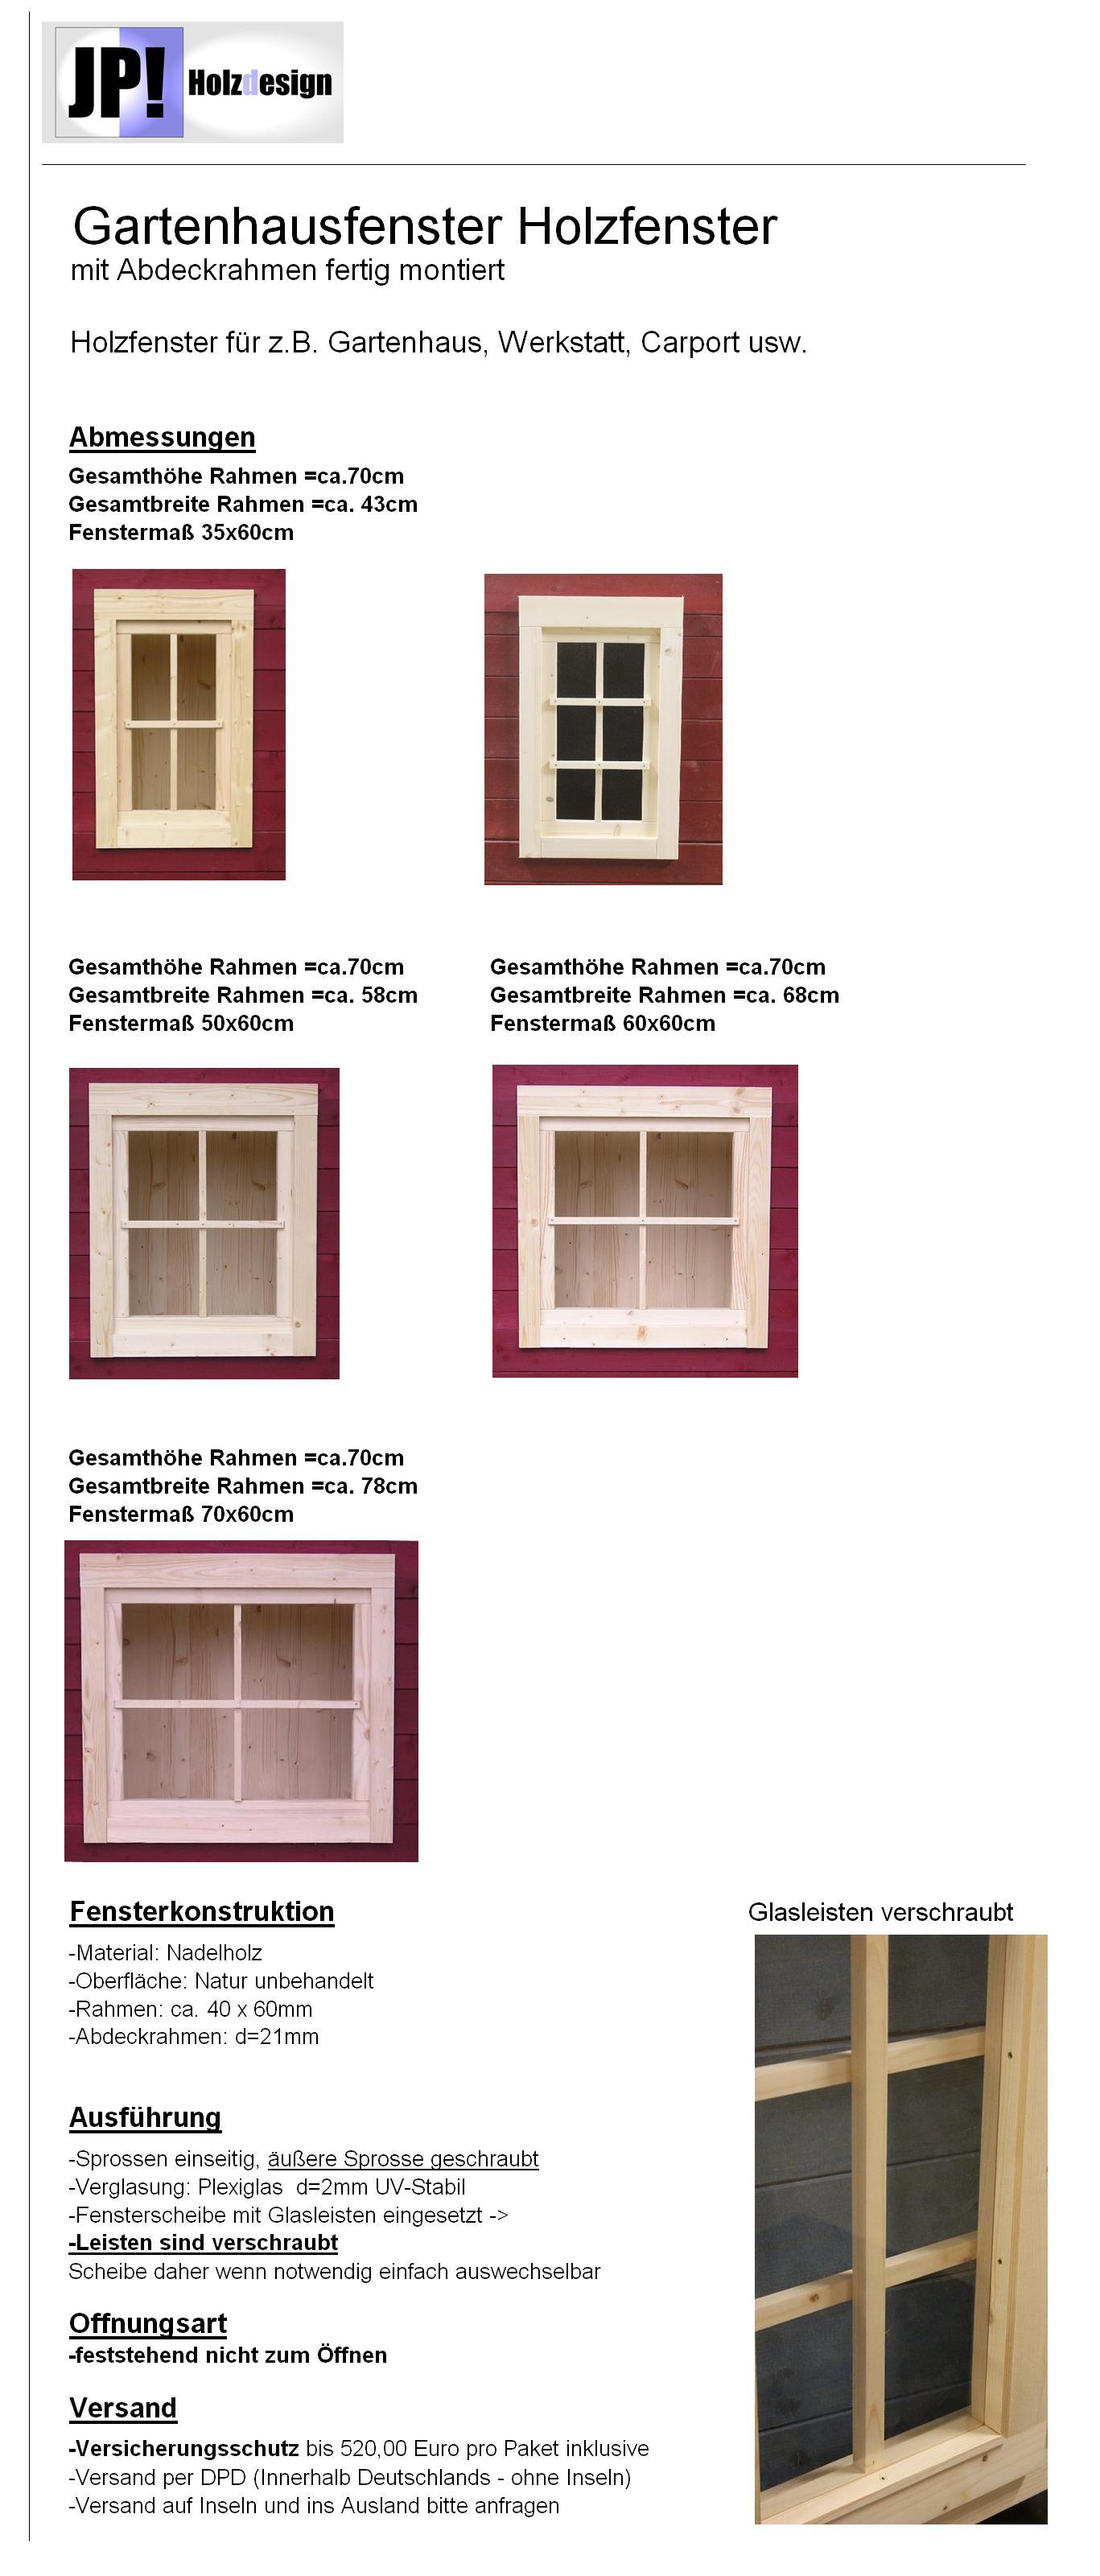 gartenhausfenster holzfenster fenster carport garage. Black Bedroom Furniture Sets. Home Design Ideas